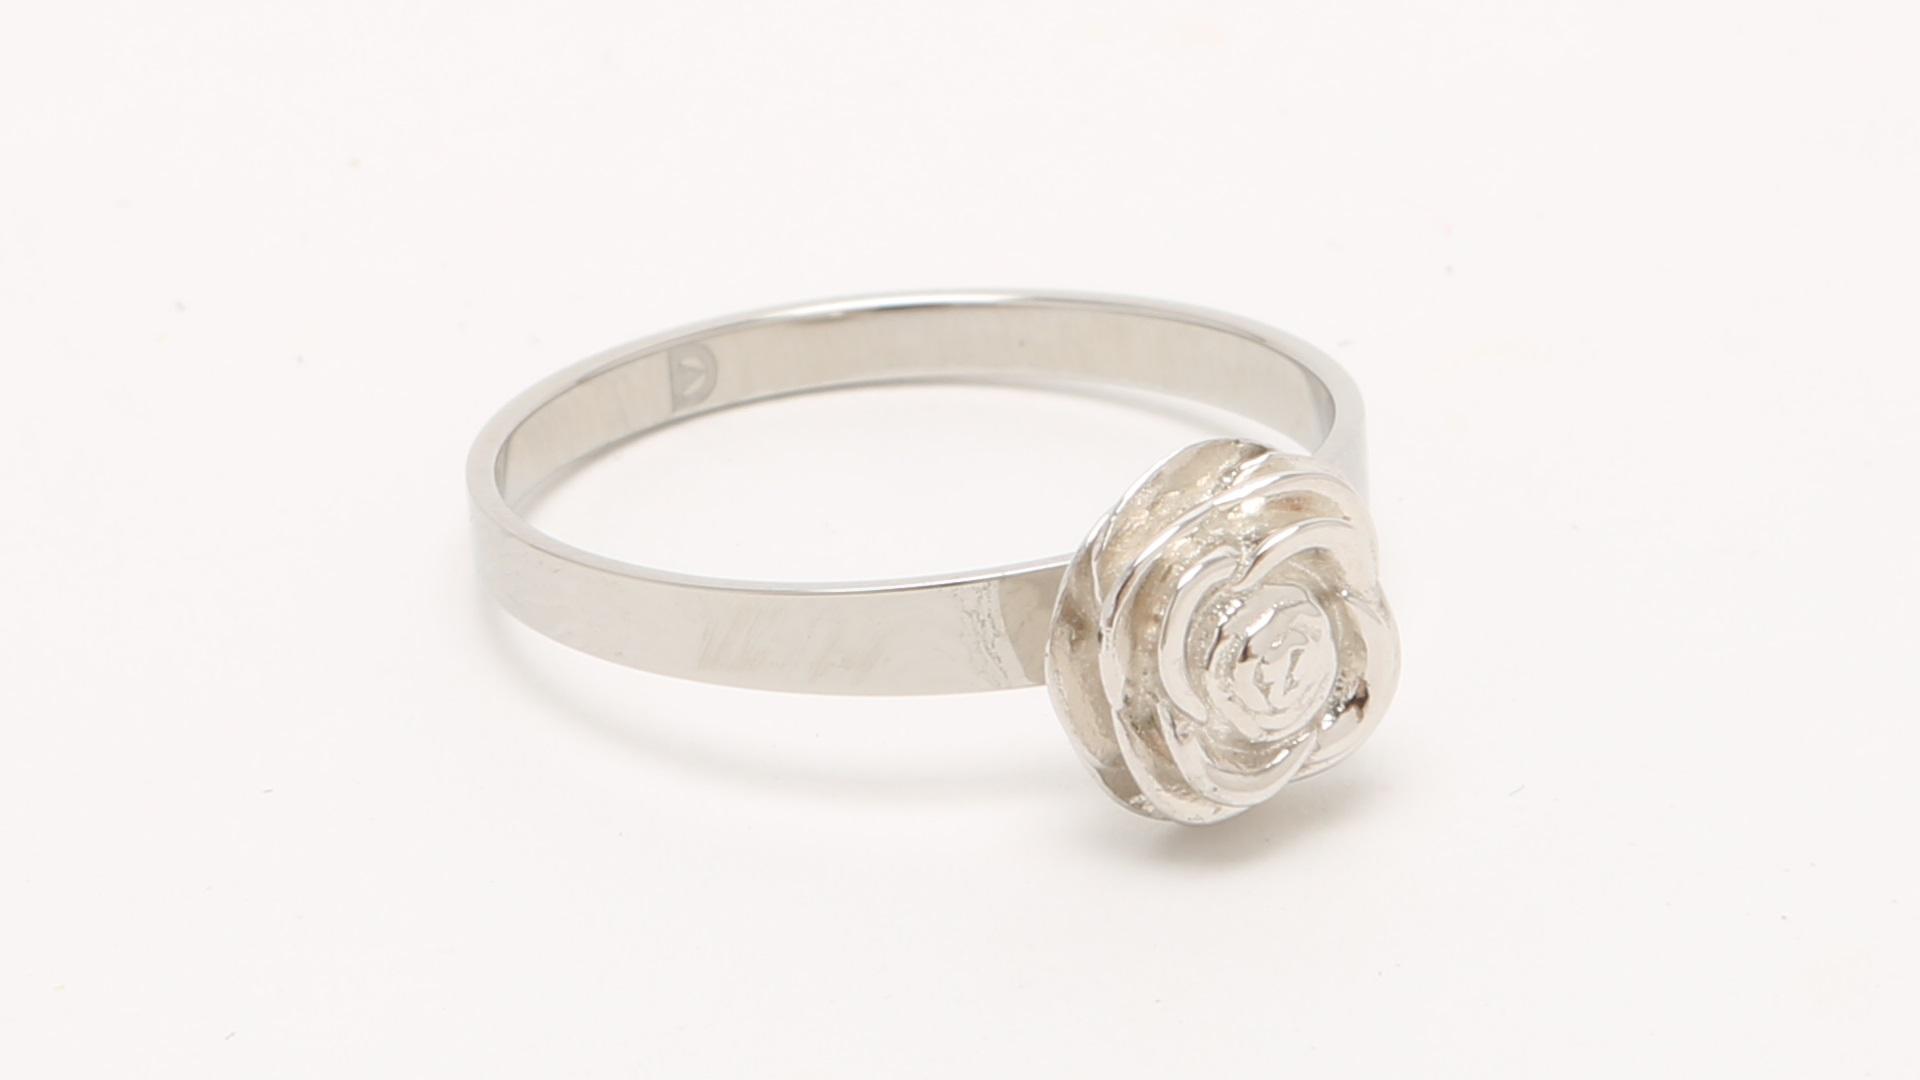 Rose Defender Ring Self-Defense Jewelry.jpg